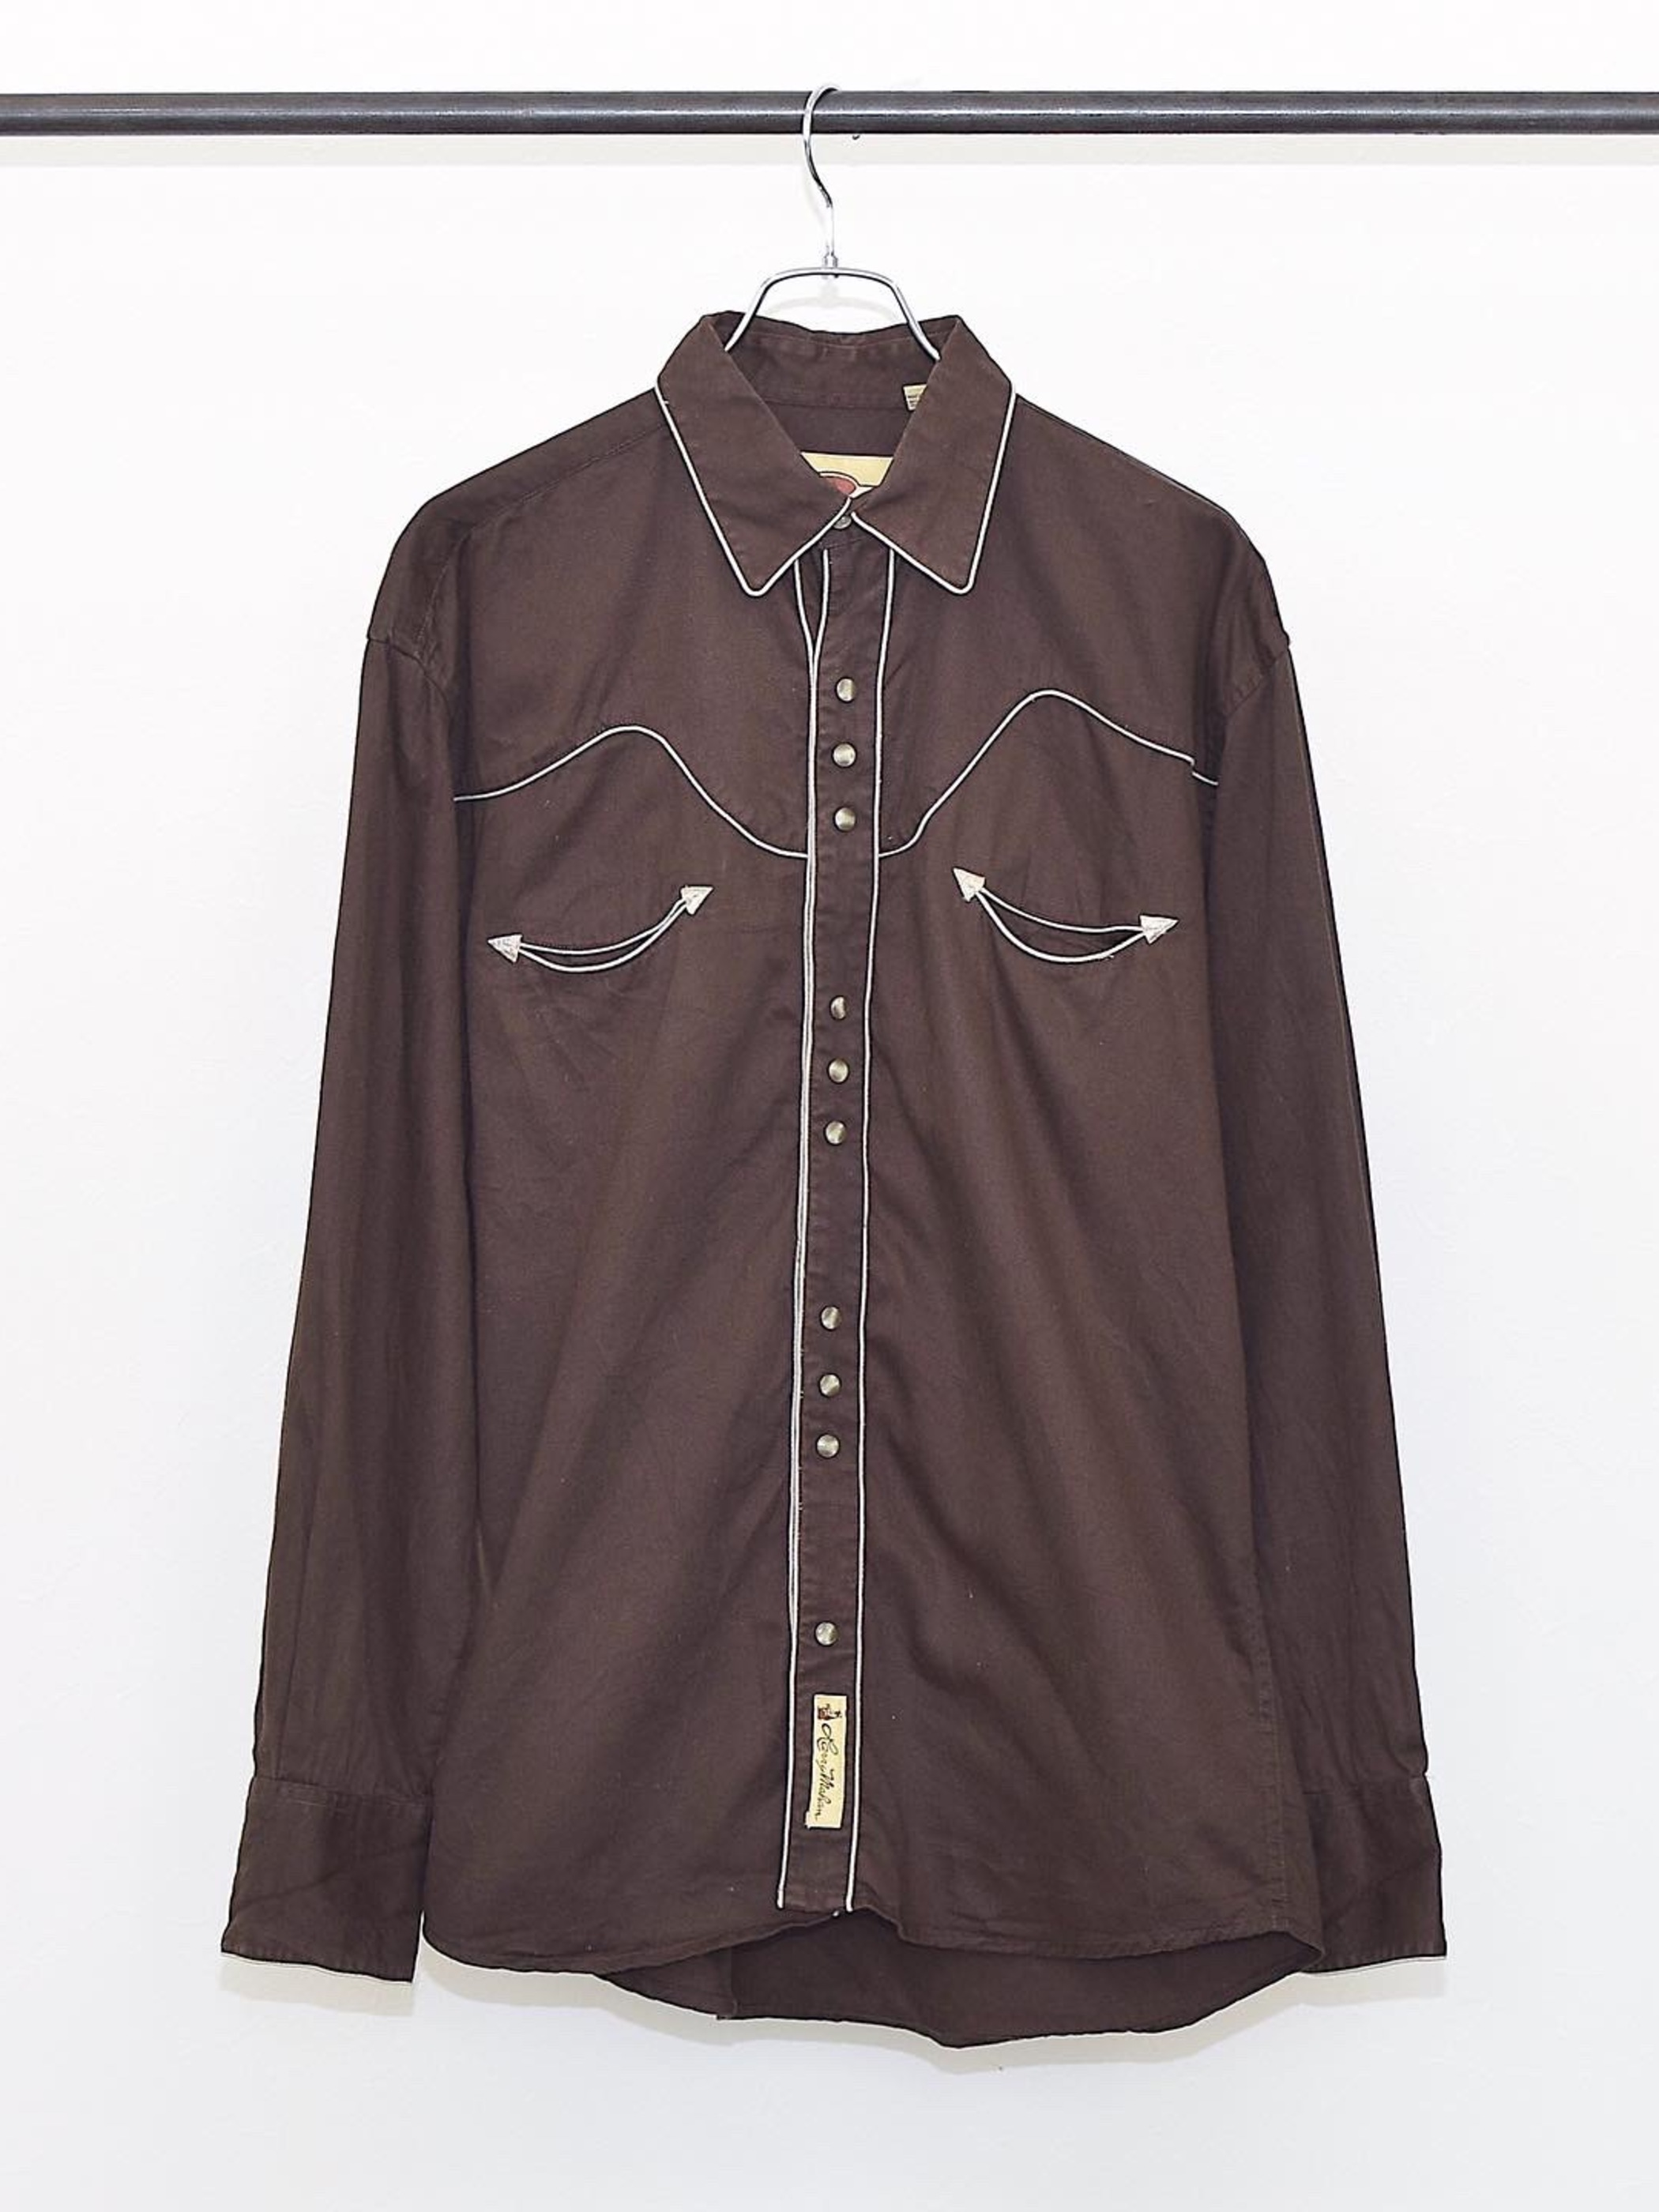 Vintage【Larry Mahan】Western Shirt